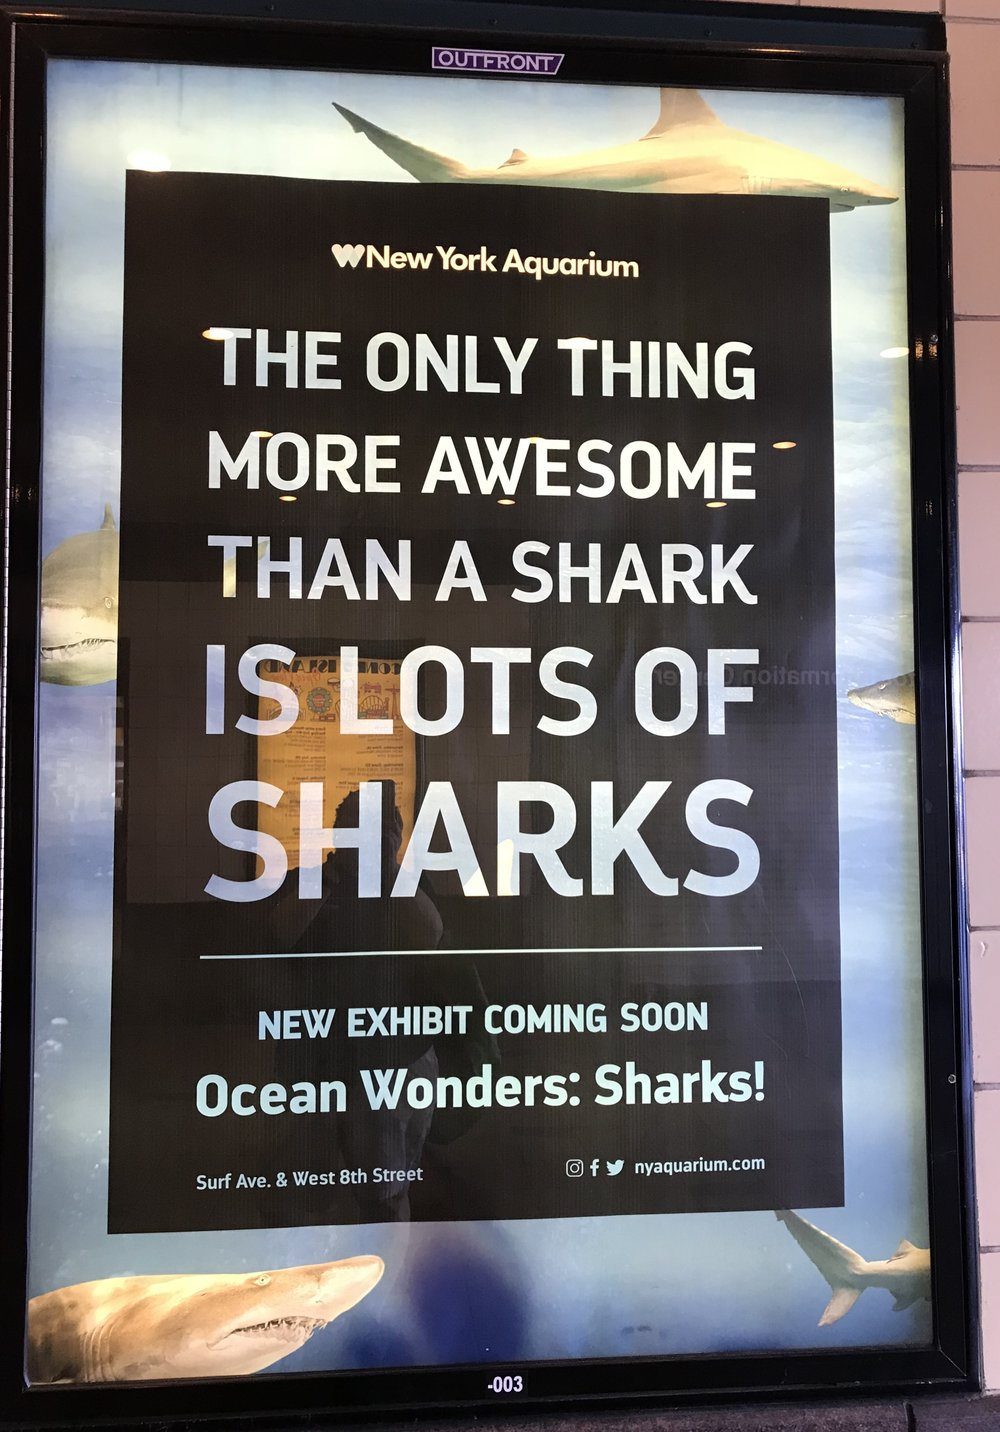 Subway Ad, Coney Island Subway Station  Photo Credit: Liz Summit, 2018